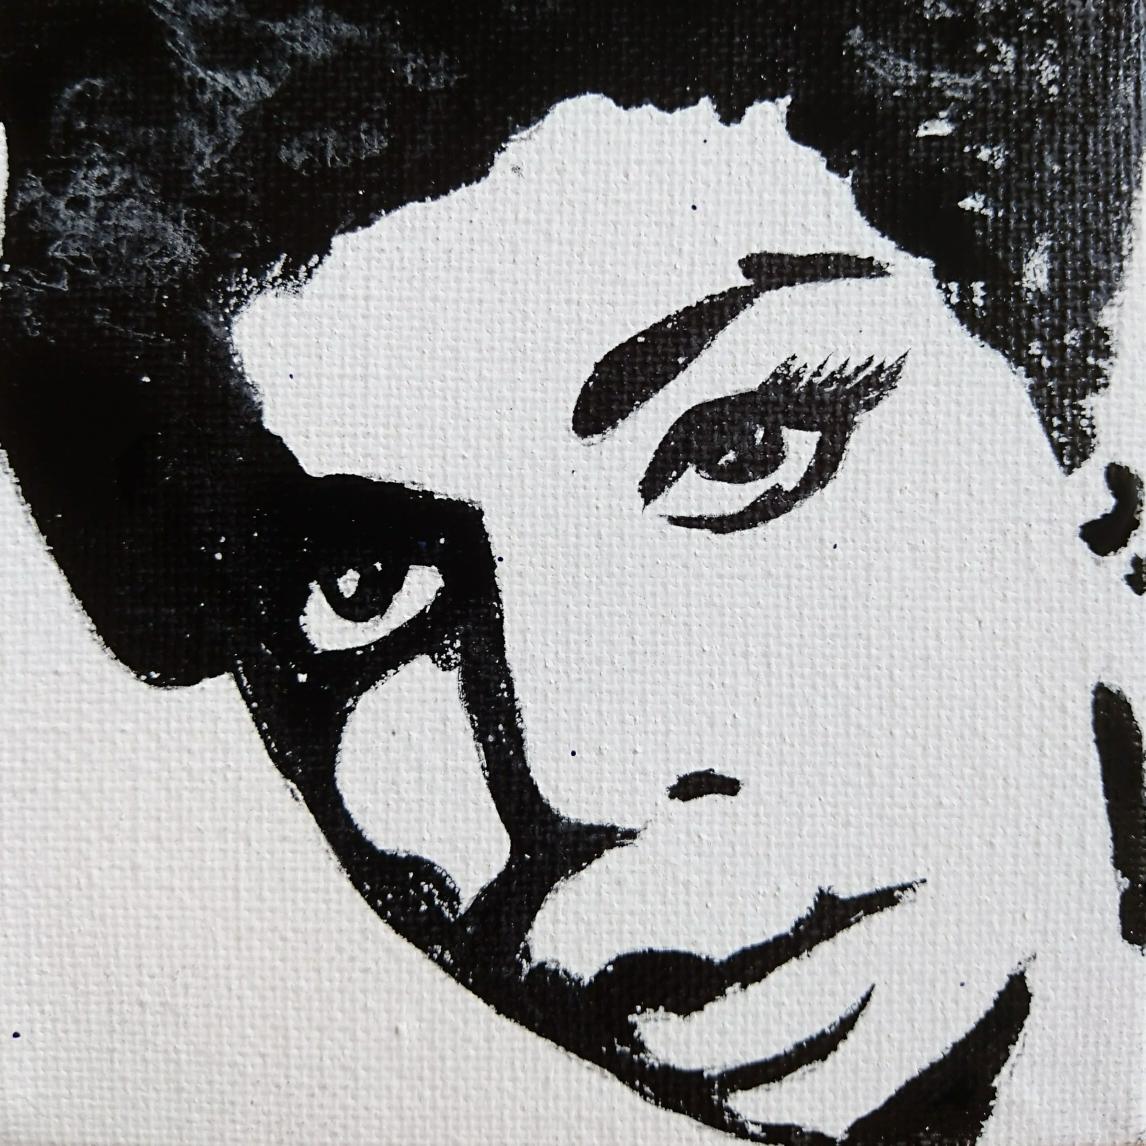 Nina Simone, singer